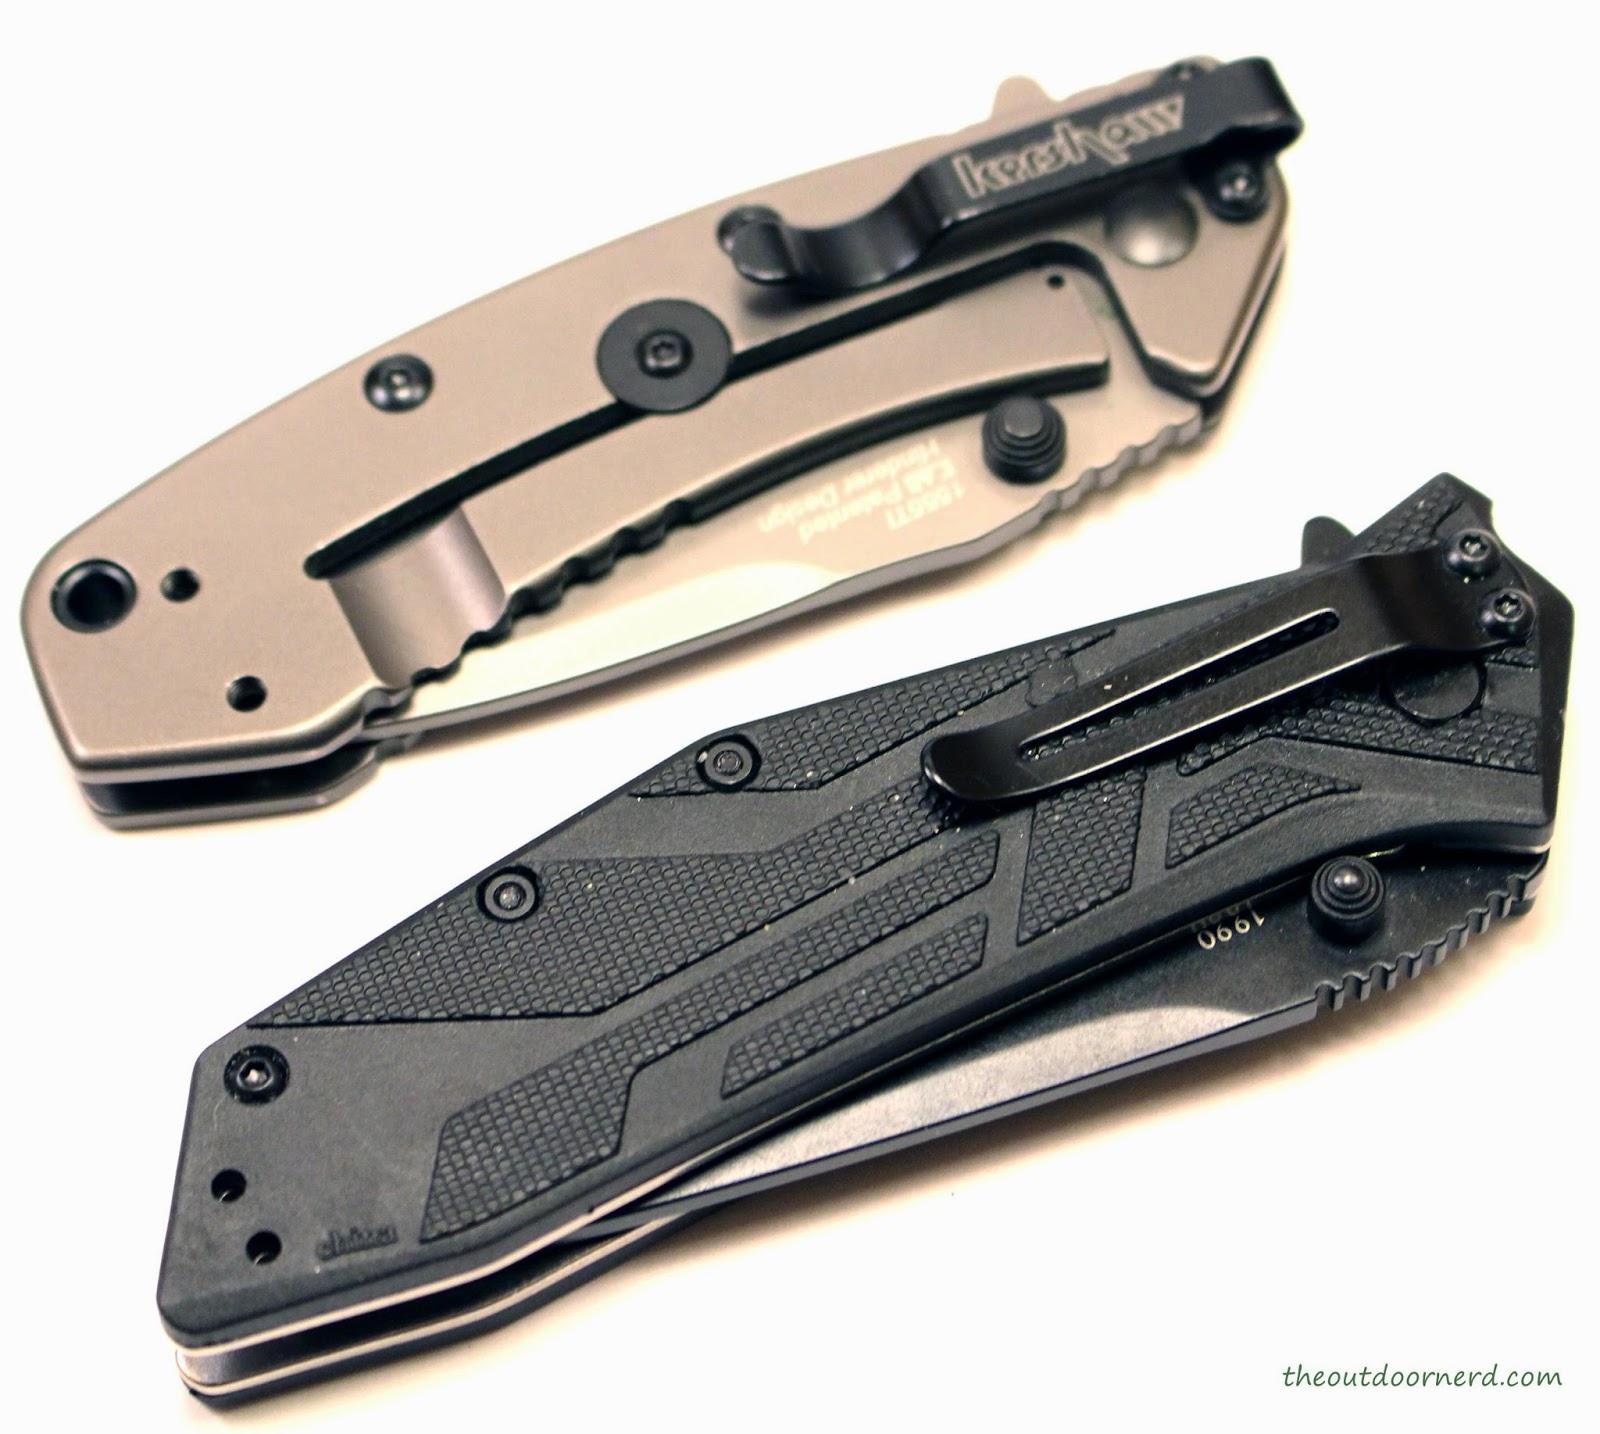 Kershaw Brawler Pocket Knife With Cryo 1